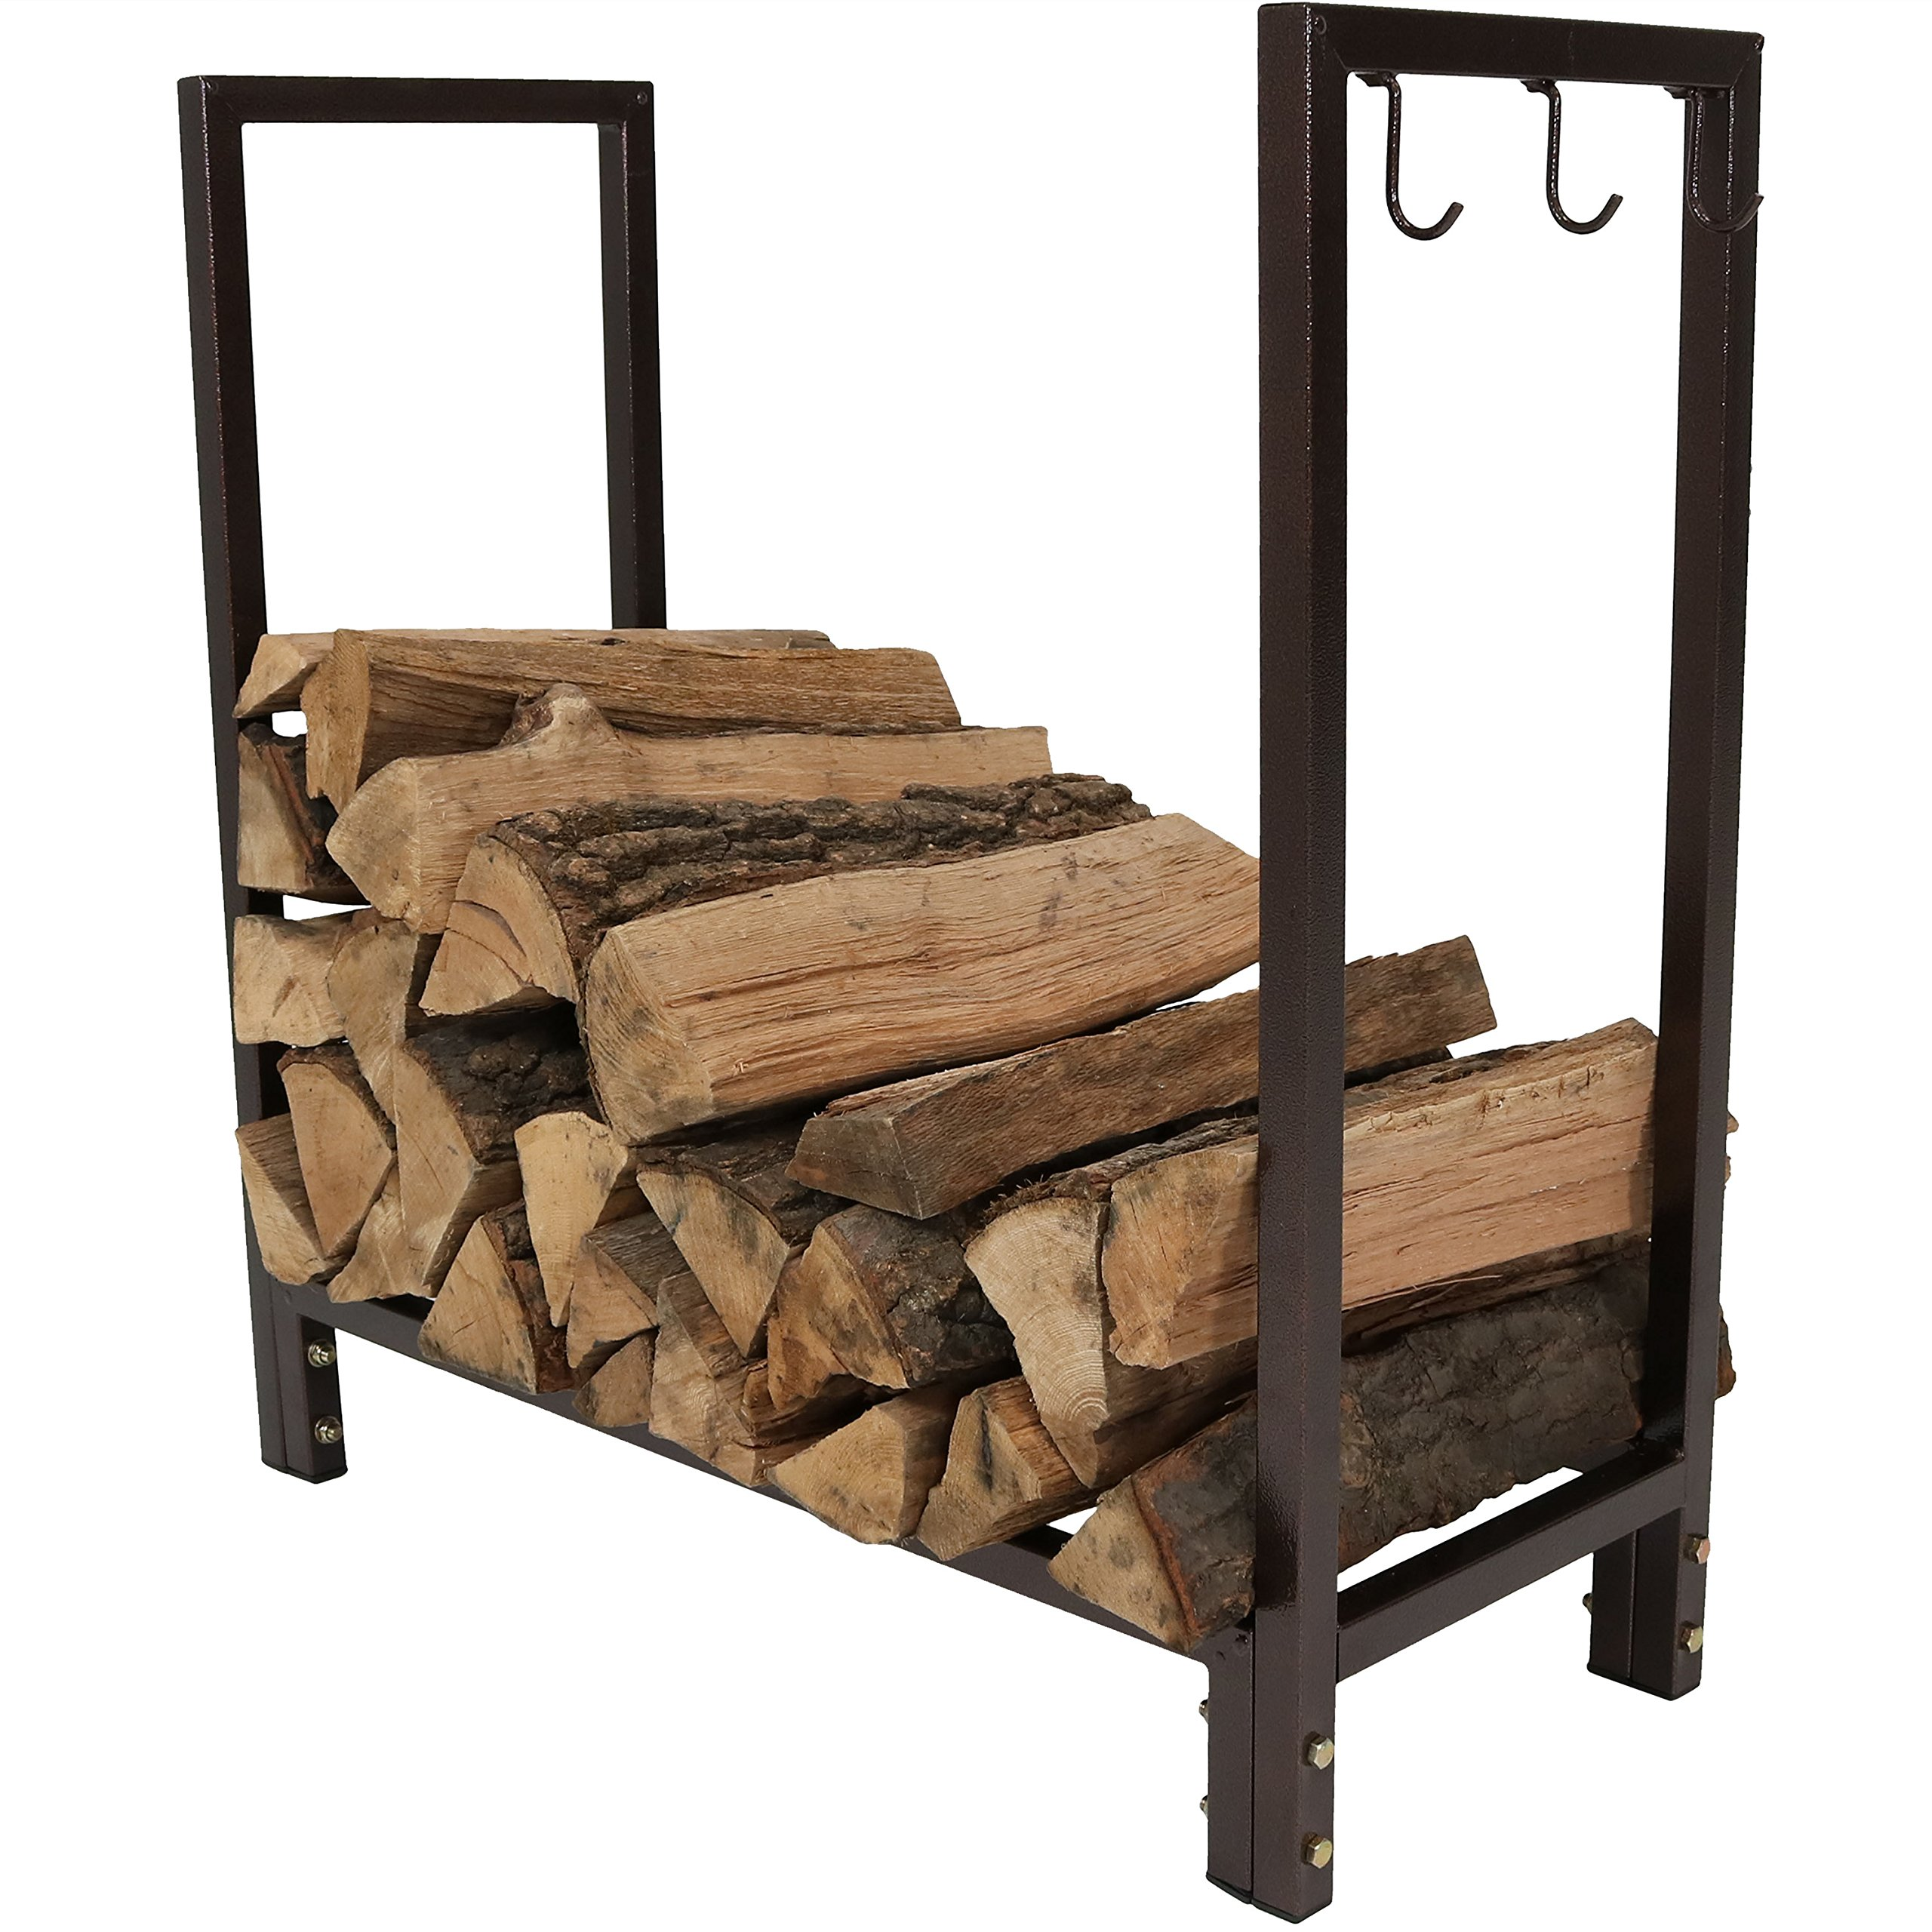 Sunnydaze Firewood Log Rack, Indoor/Outdoor Wood Storage Holder for Fireplace, Bronze, 30 Inch by Sunnydaze Decor